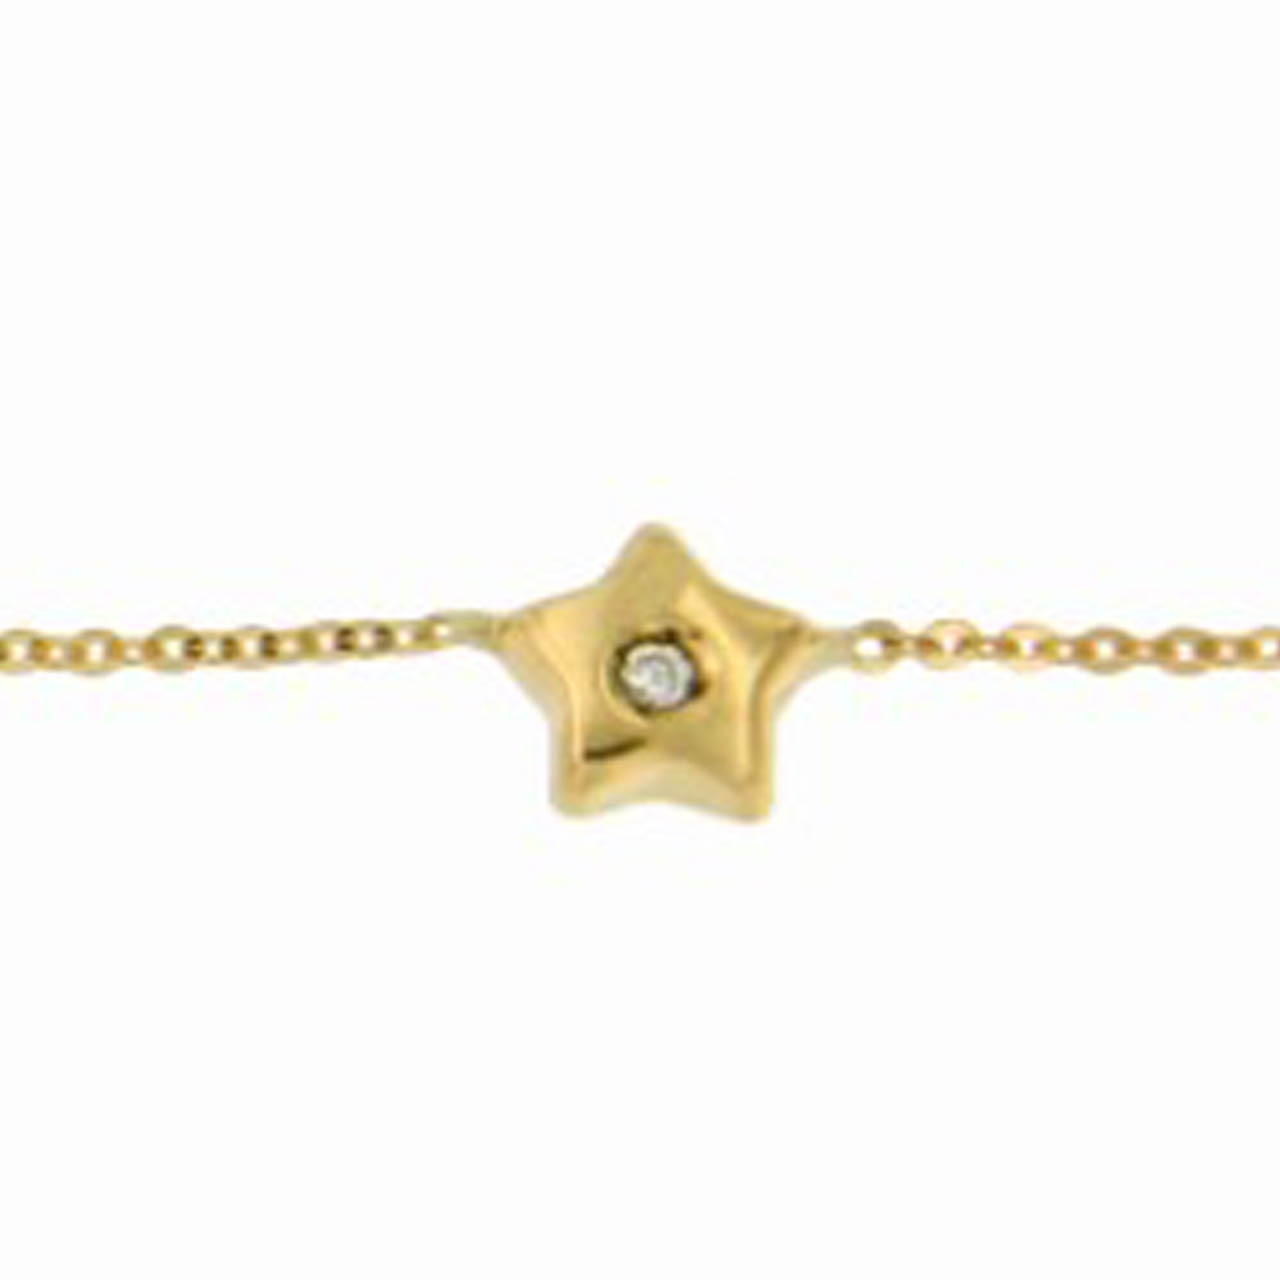 Armbanden 18 karaat 17-19 cm